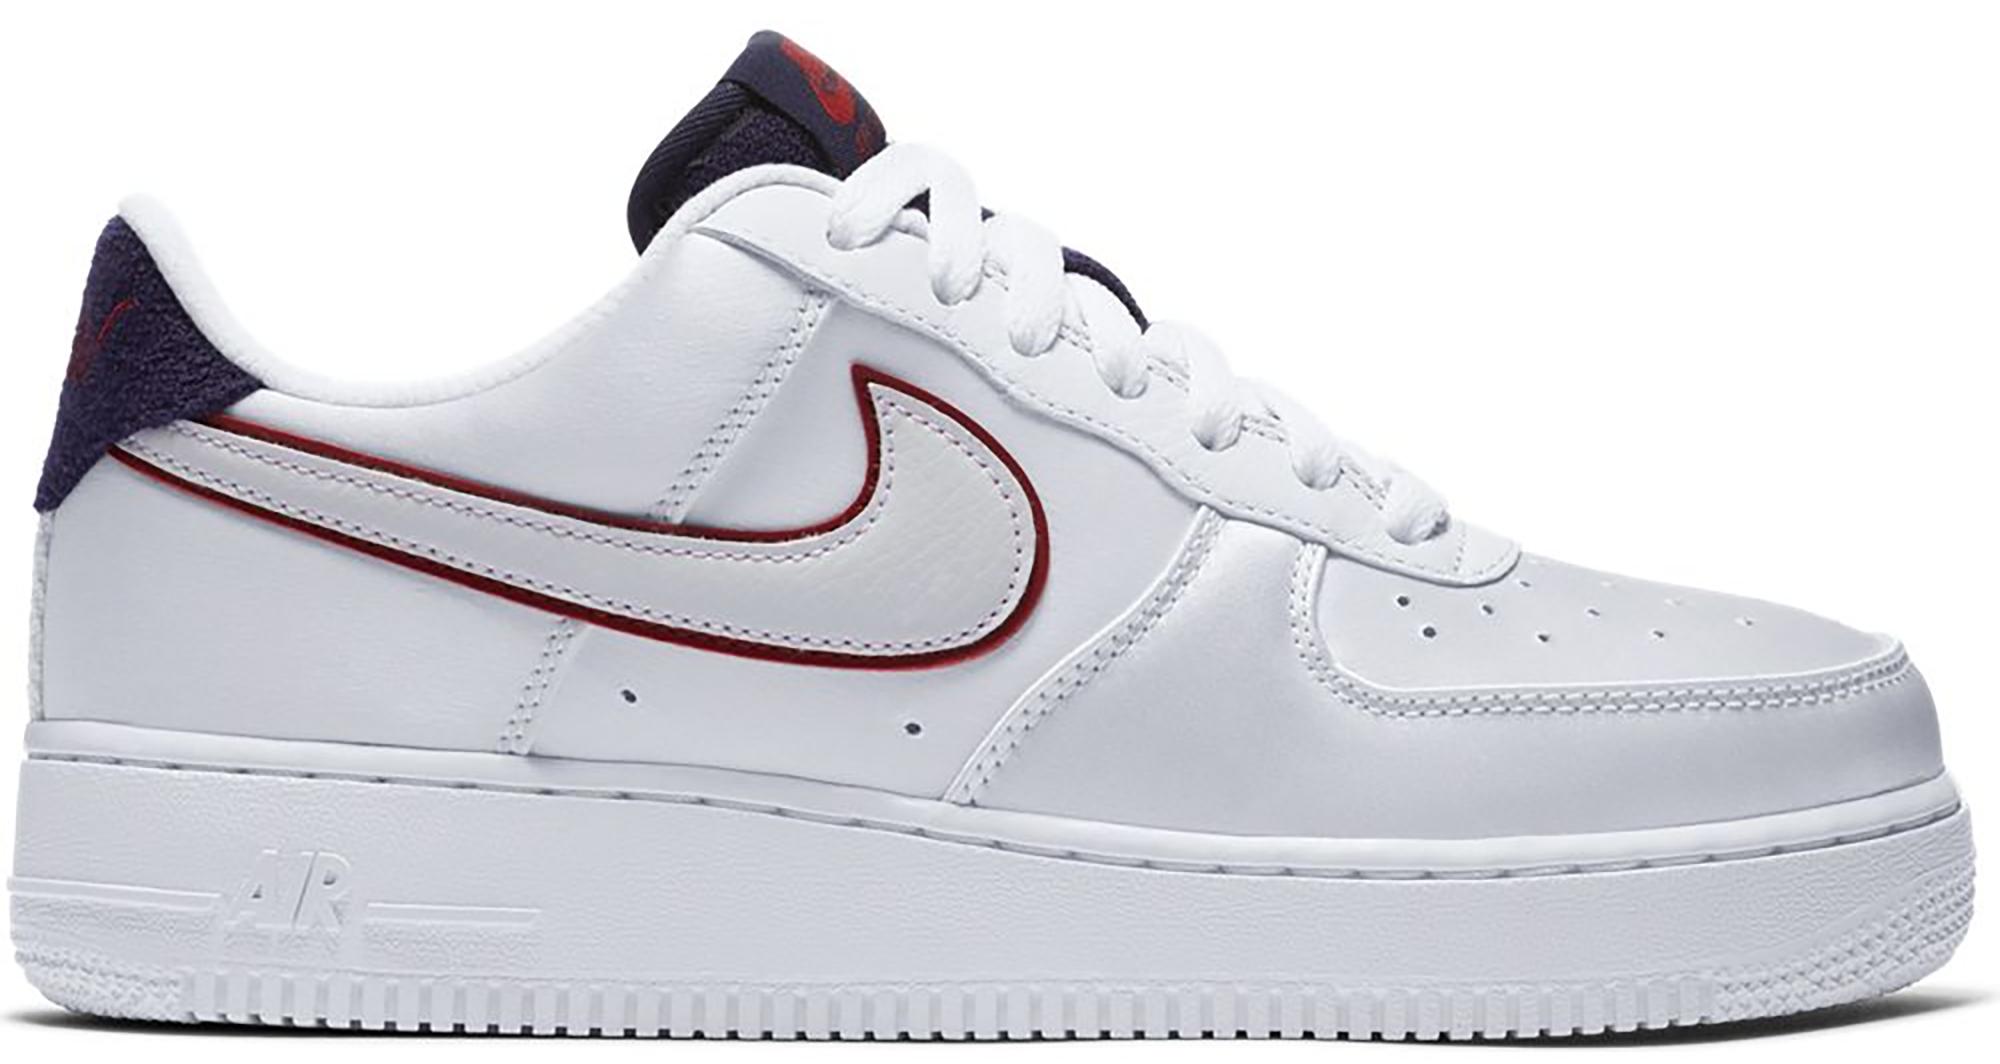 Nike Air Force 1 Low NSW White Satin (W